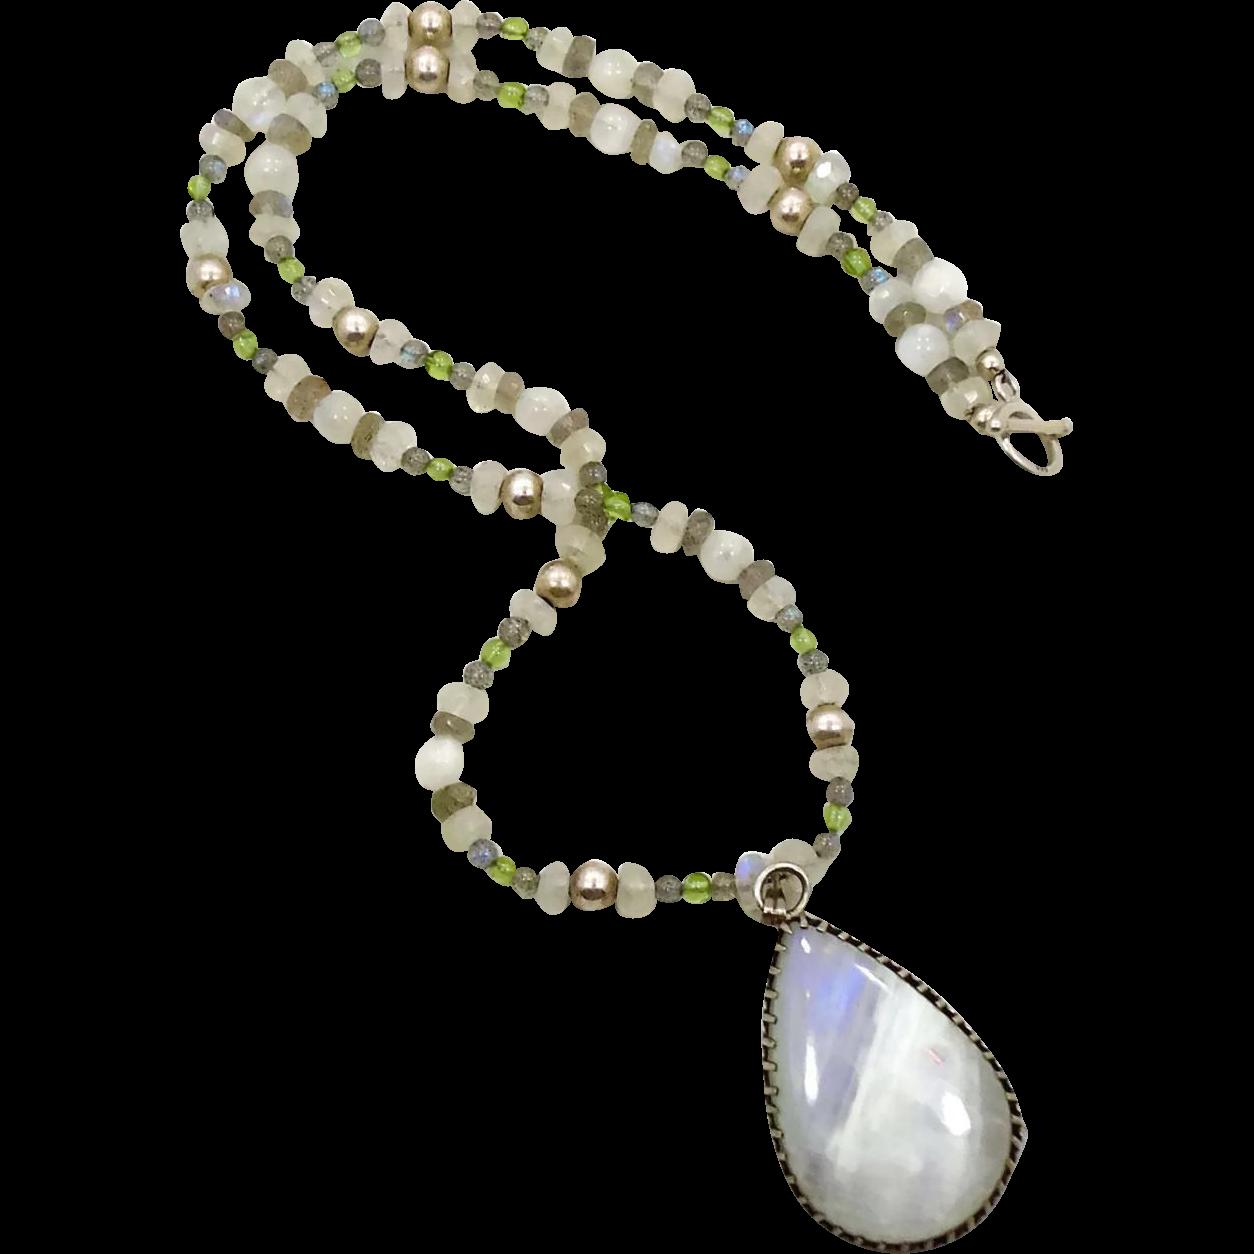 White Moonstone, Moonstone Necklace, Moonstone Earrings ...